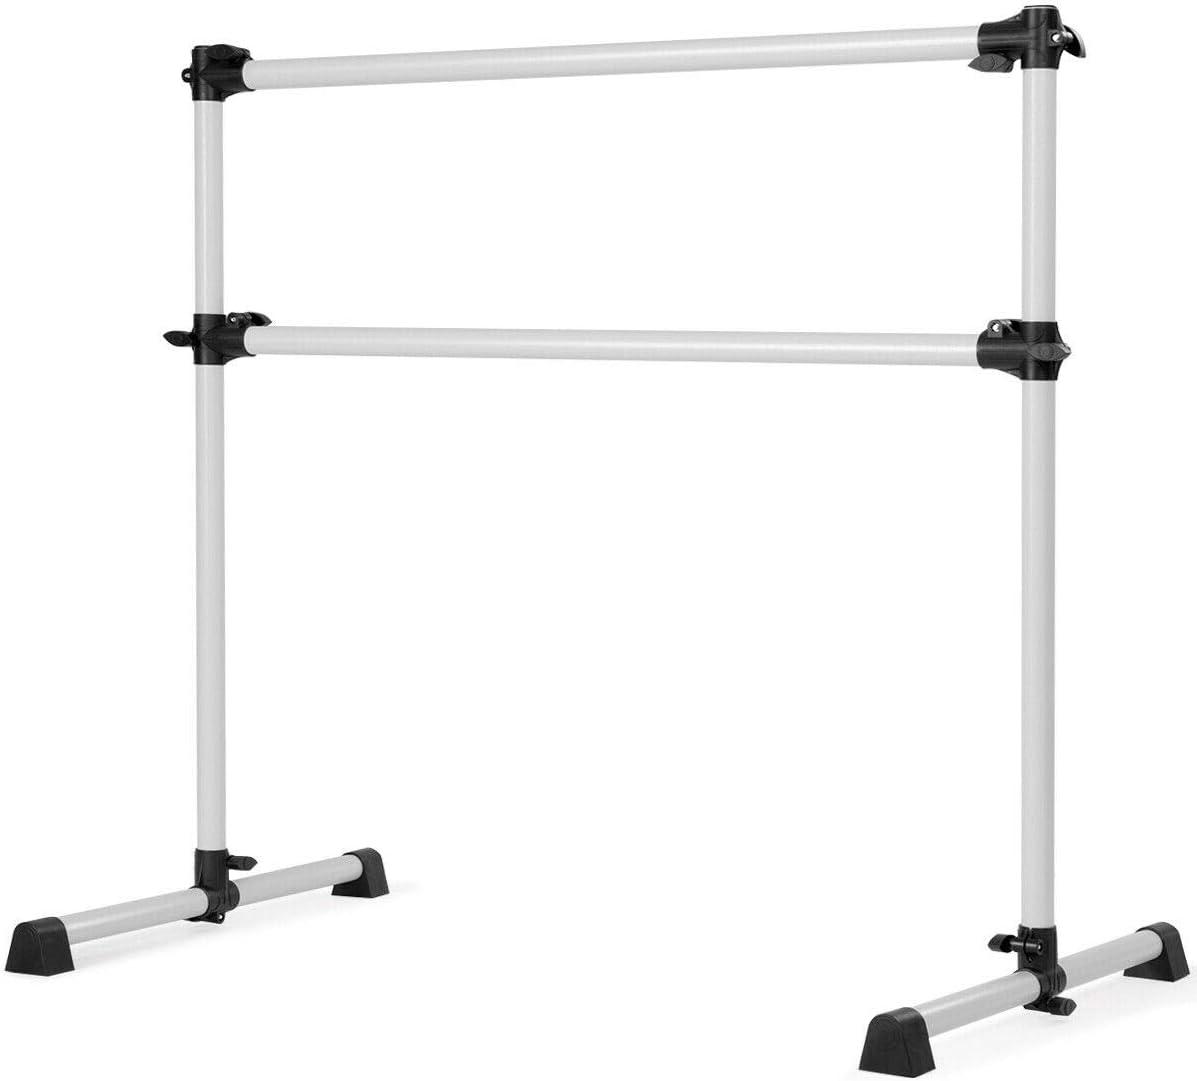 ABORON 4x4ft Ballet Barre Portable Freestanding Double Ballet Barre Adjustable Dancing Stretching Ballet for Home,Dance Barre, Fitness Ballet Bar